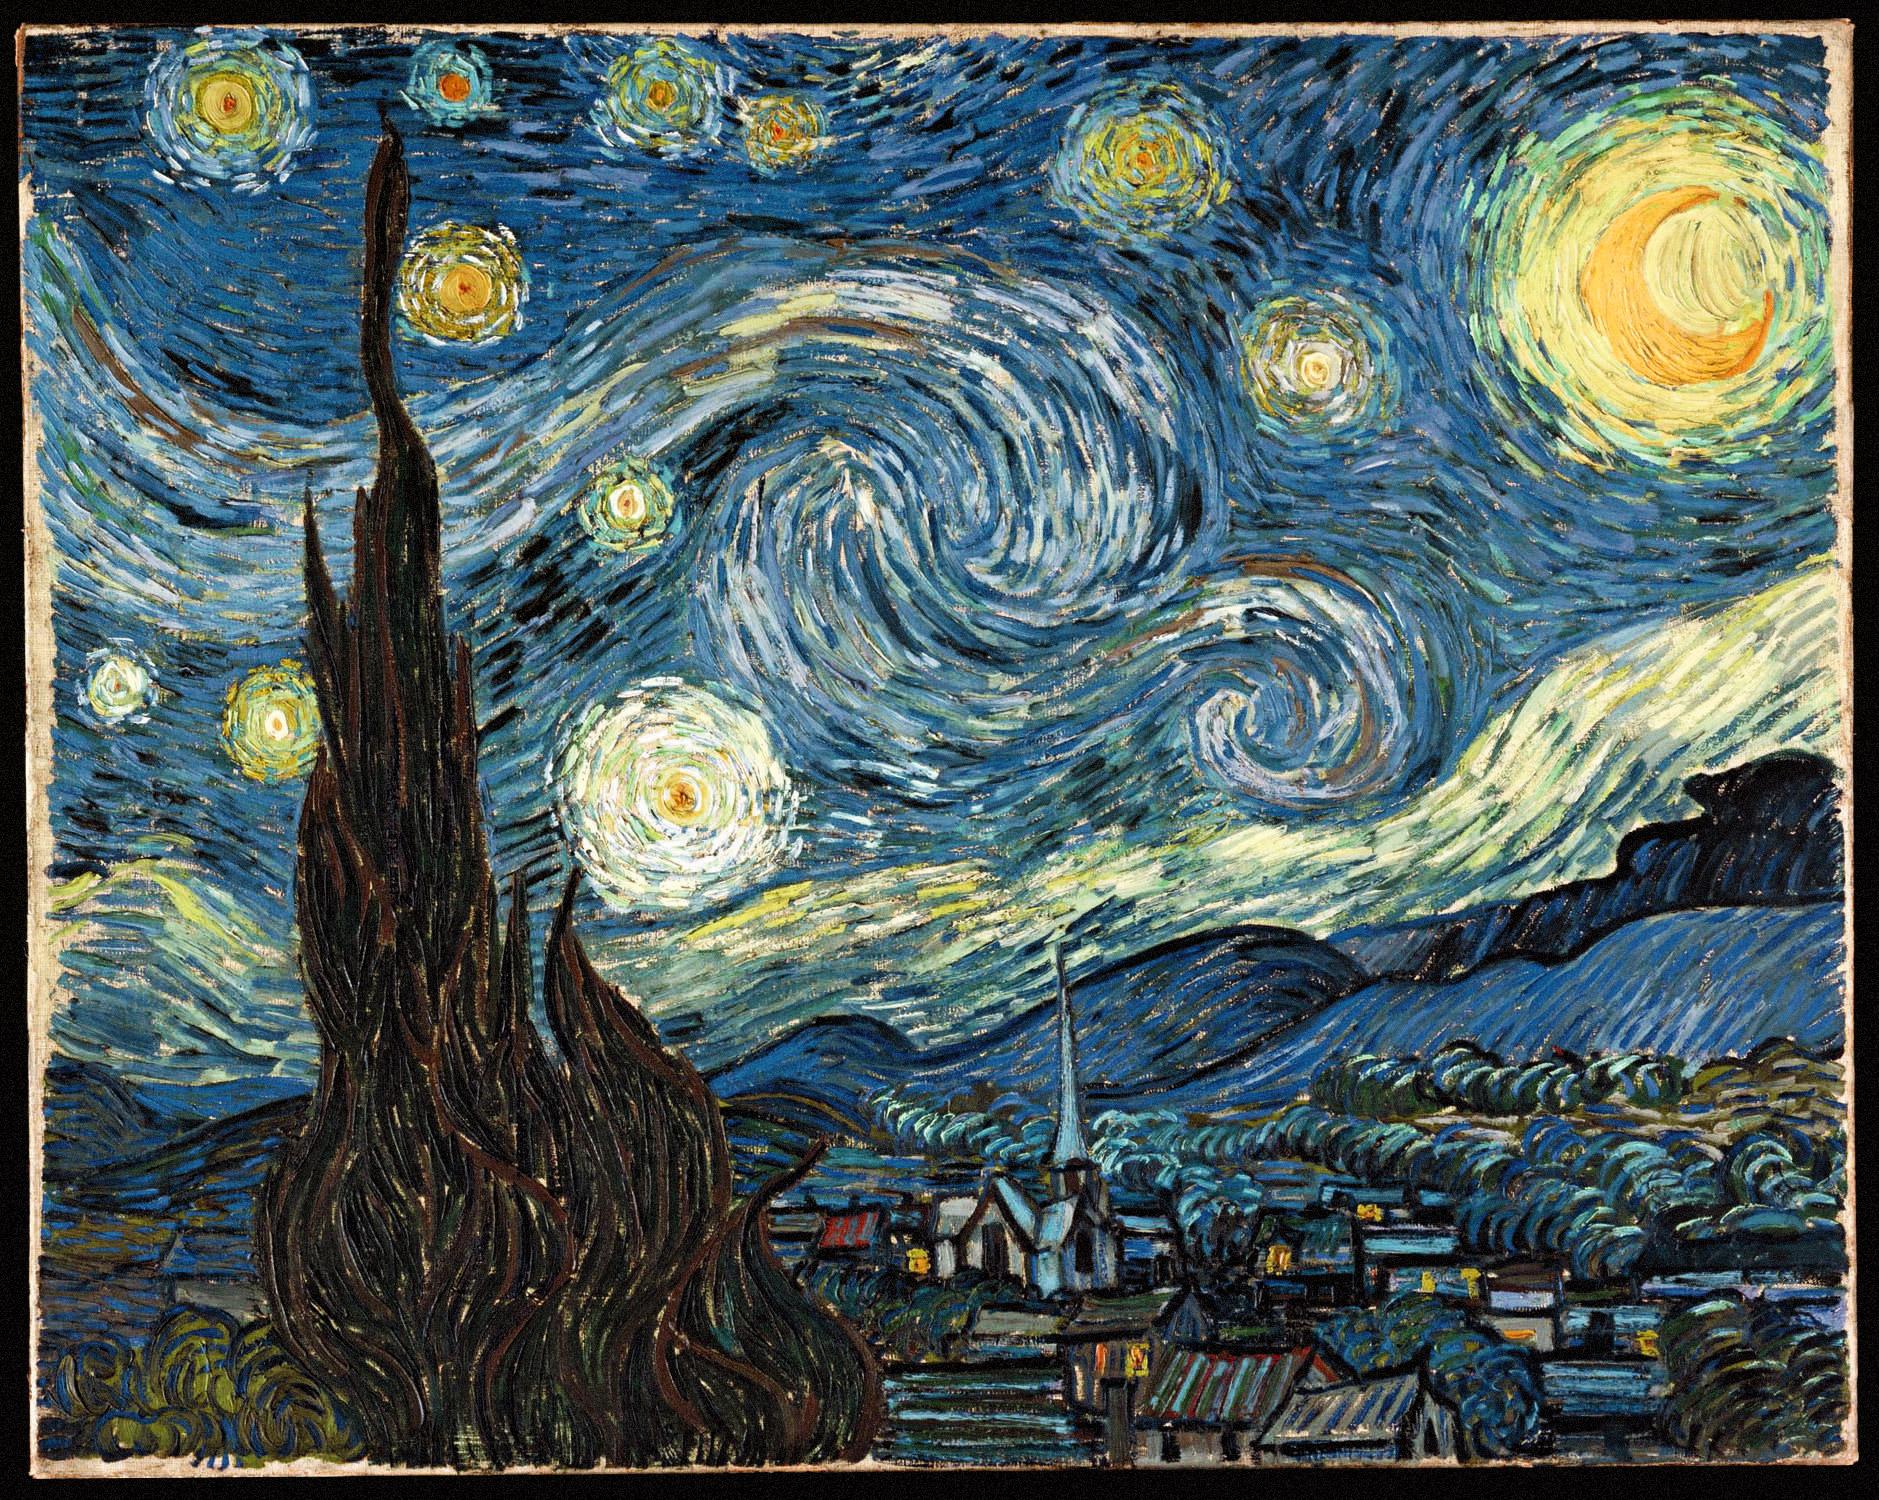 https://i1.wp.com/upload.wikimedia.org/wikipedia/commons/6/69/VanGogh-starry_night_edit.jpg